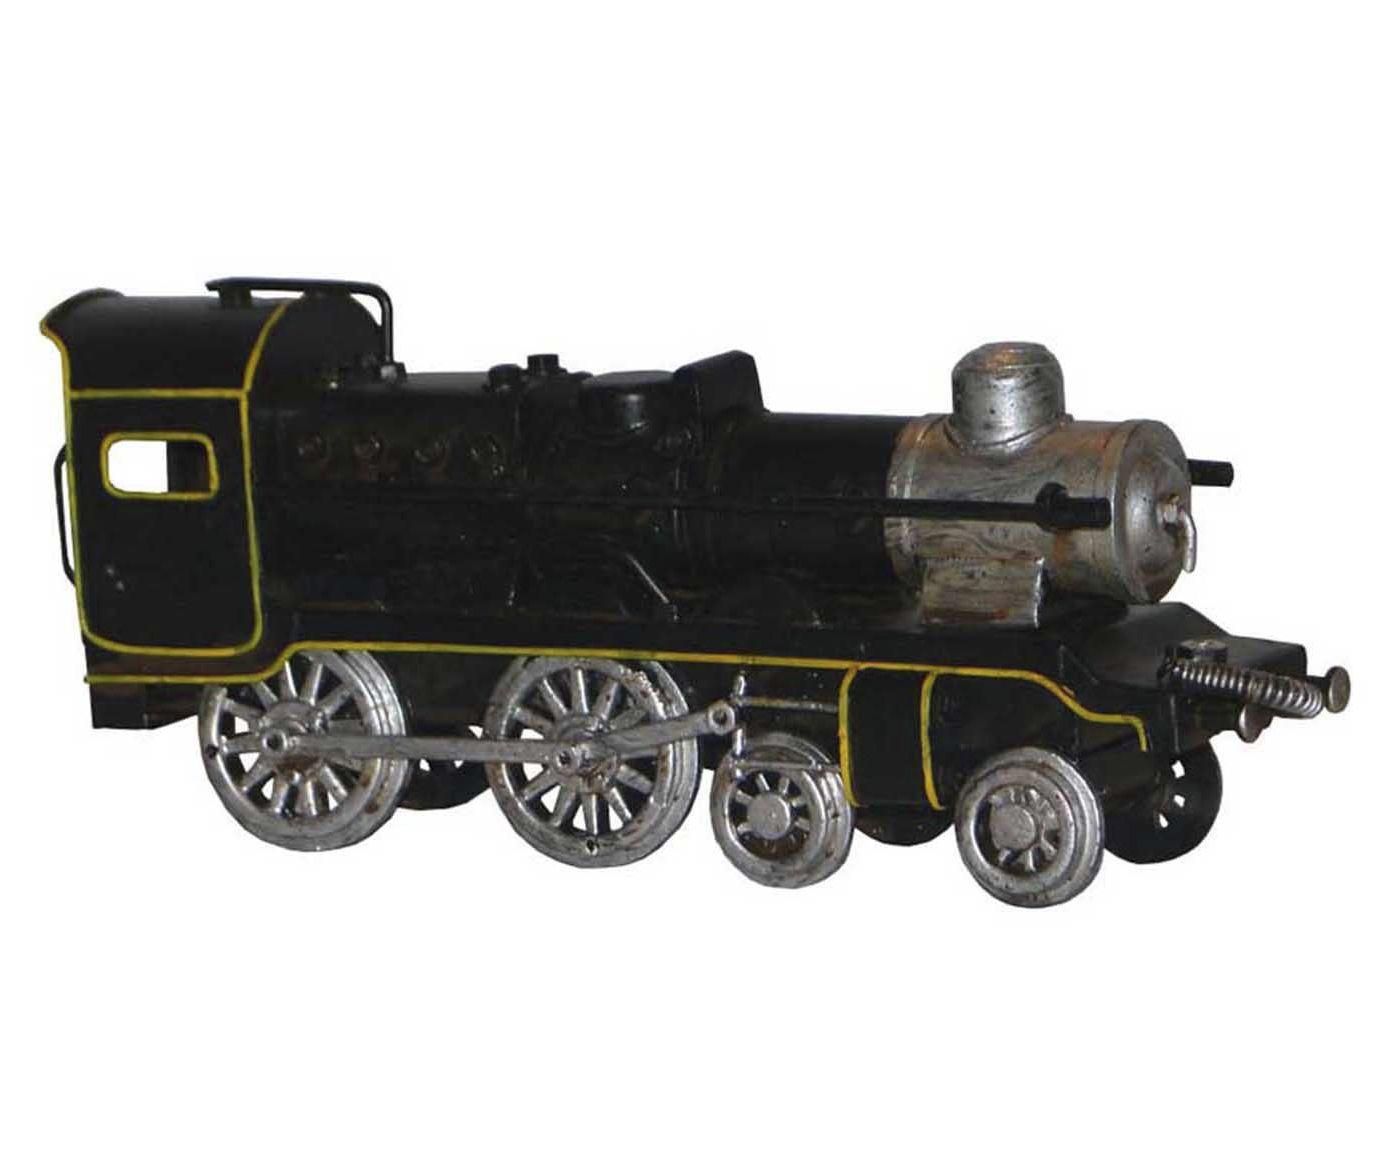 Miniatura Locomotiva | Westwing.com.br